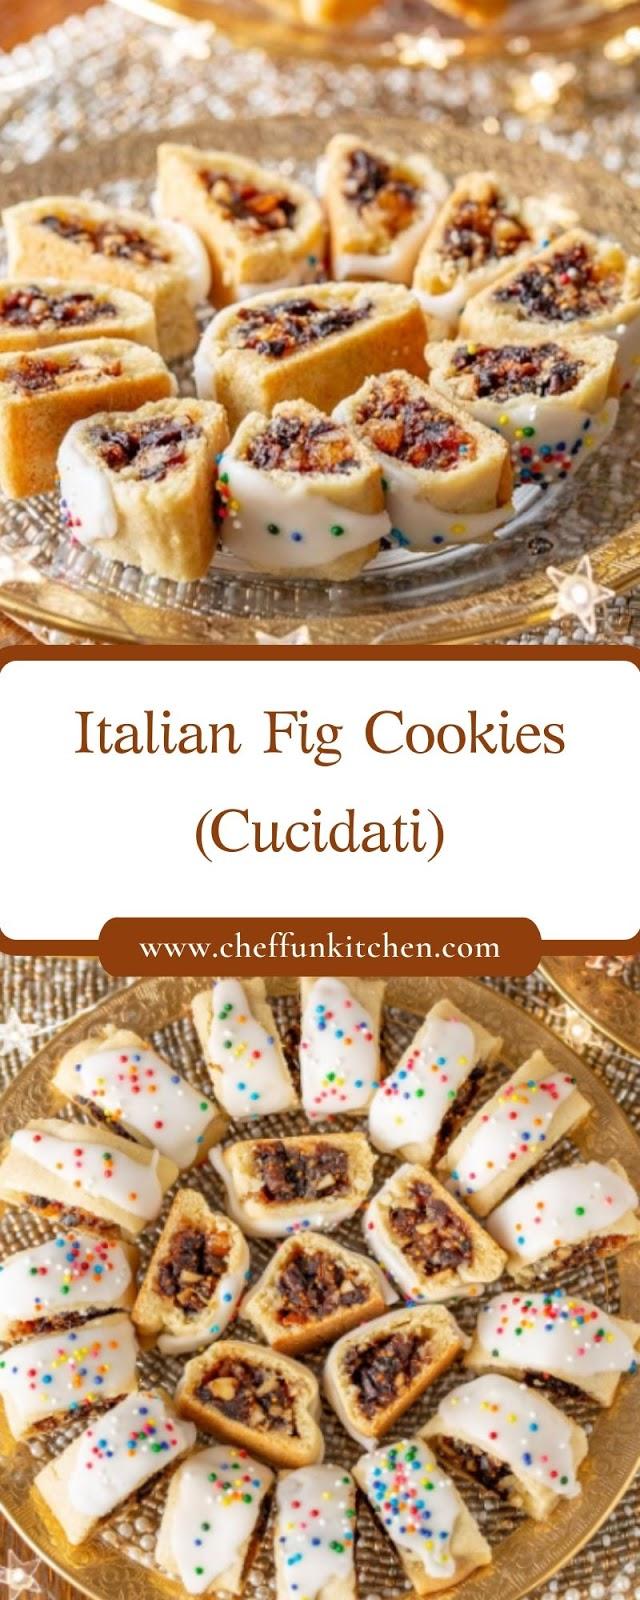 Italian Fig Cookies (Cucidati)